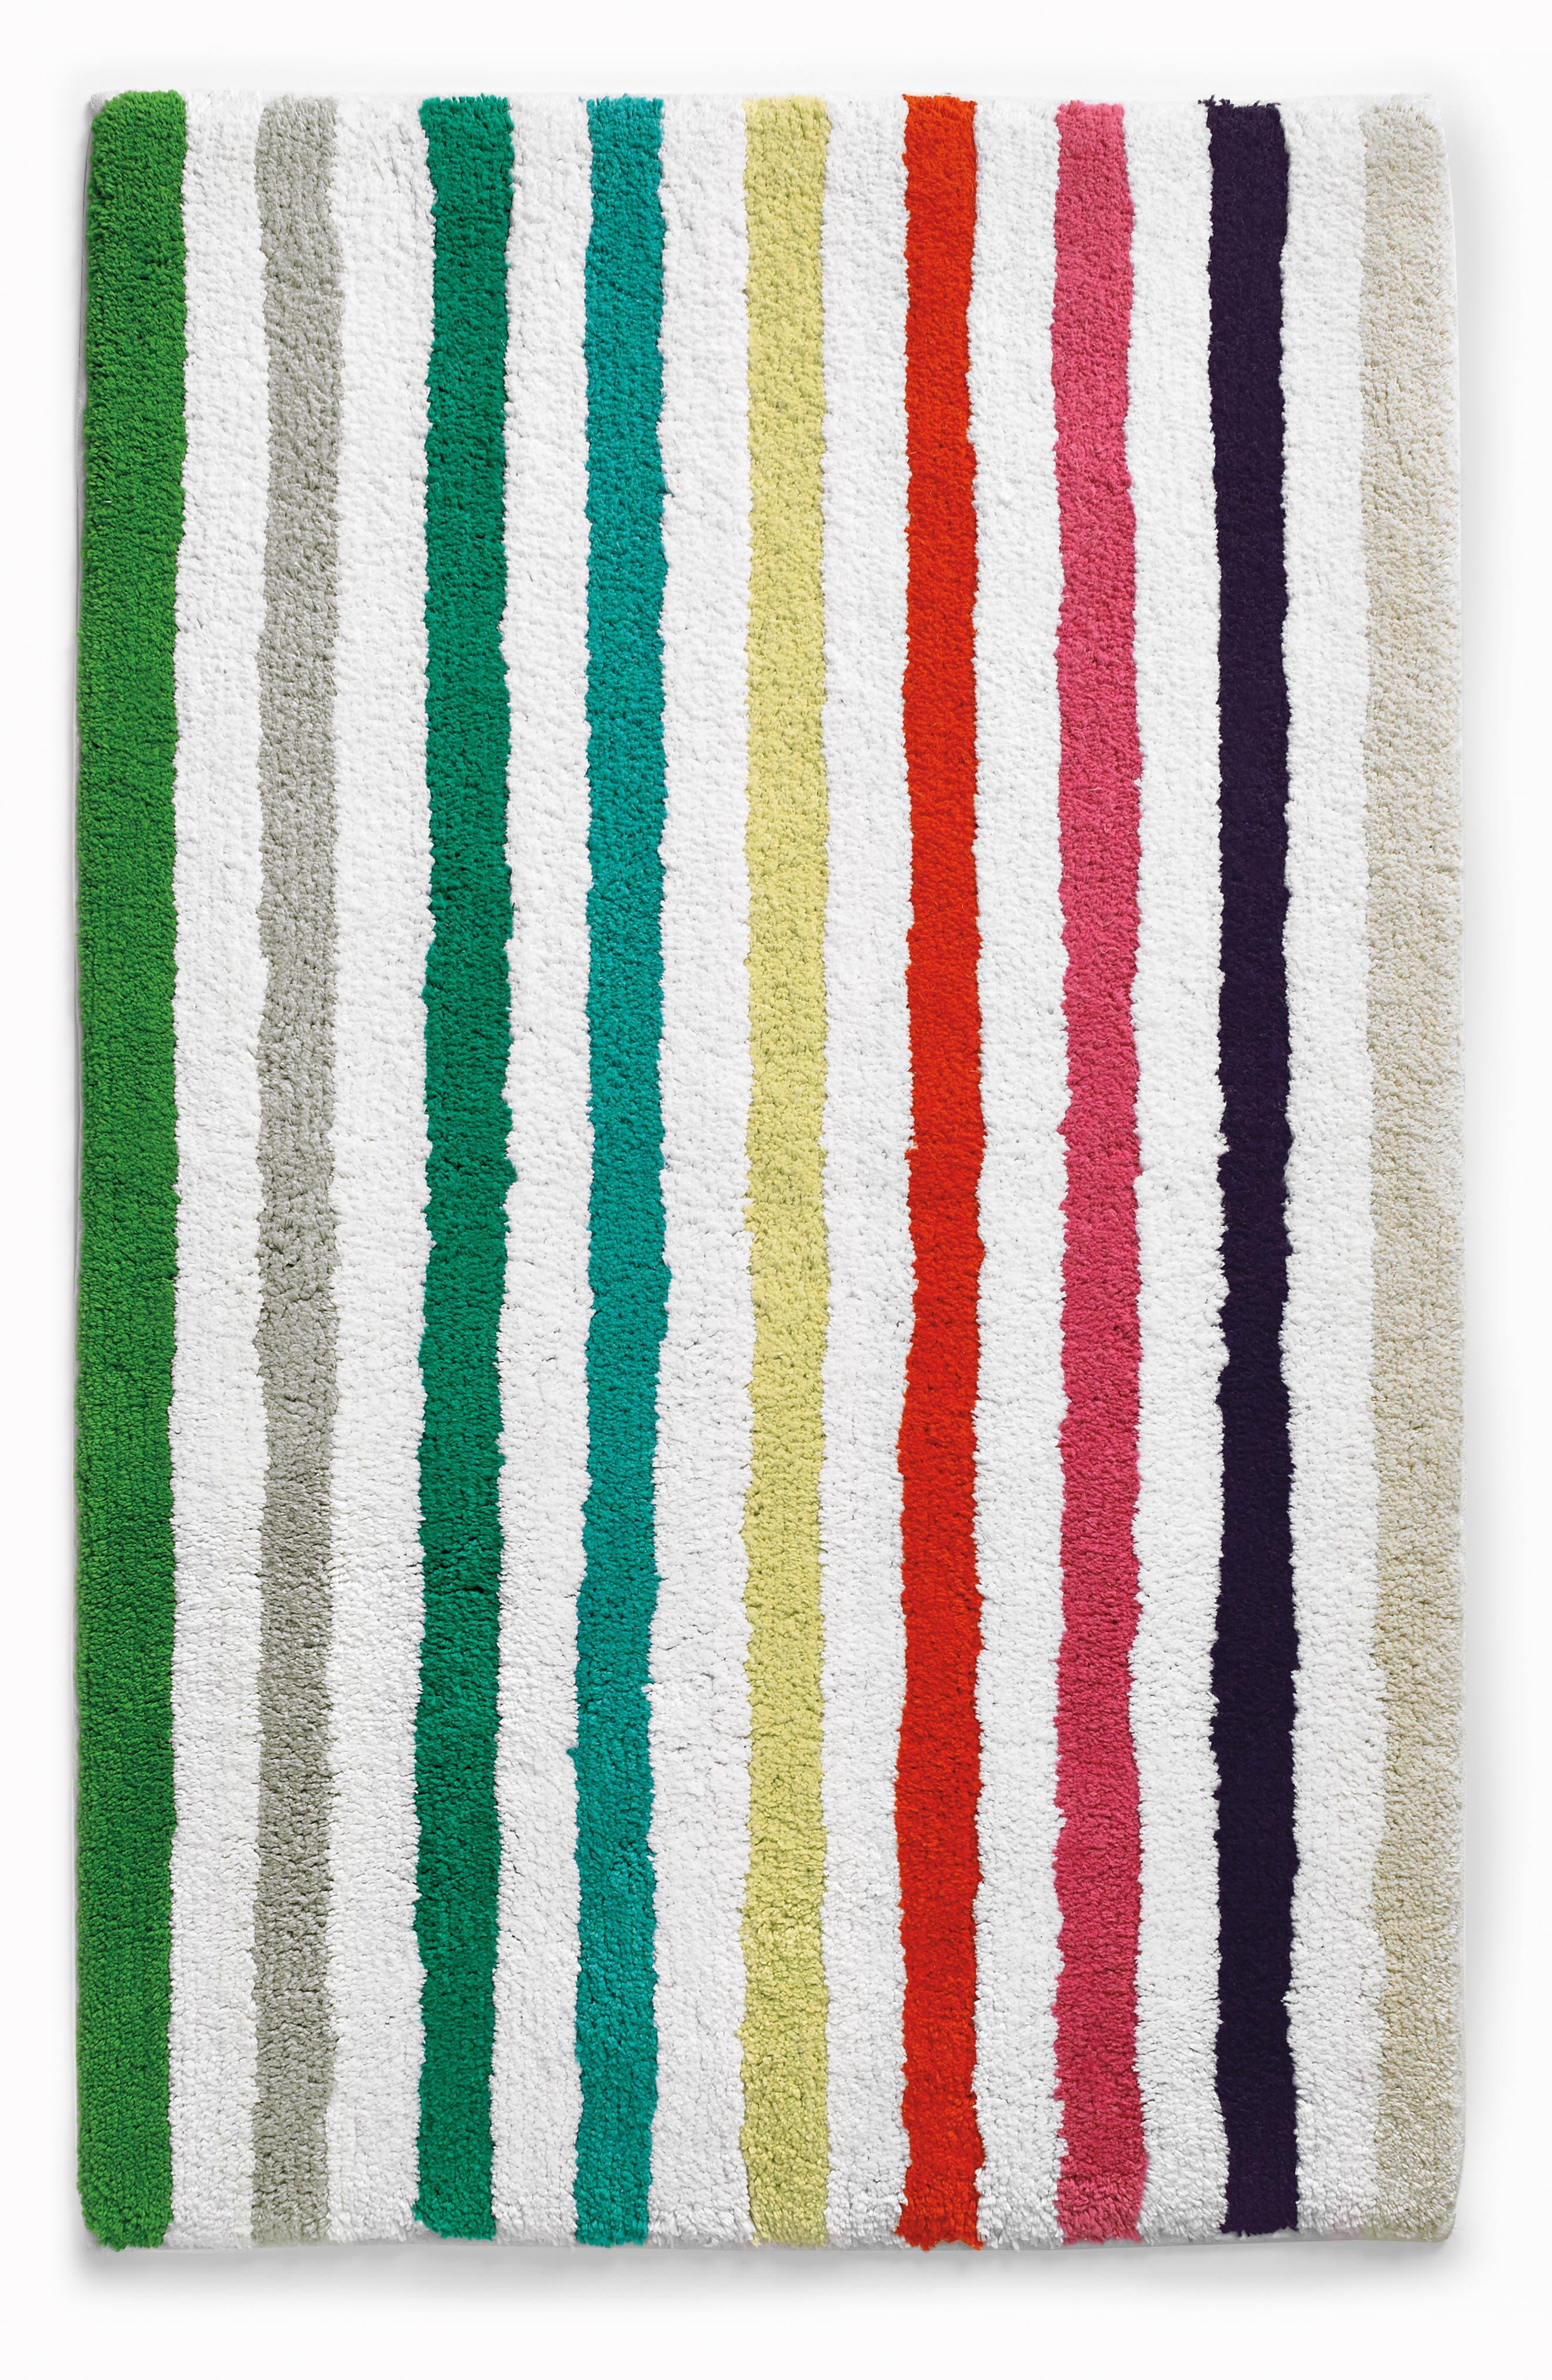 KATE SPADE NEW YORK, candy stripe bath rug, Main thumbnail 1, color, WHITE MULTI